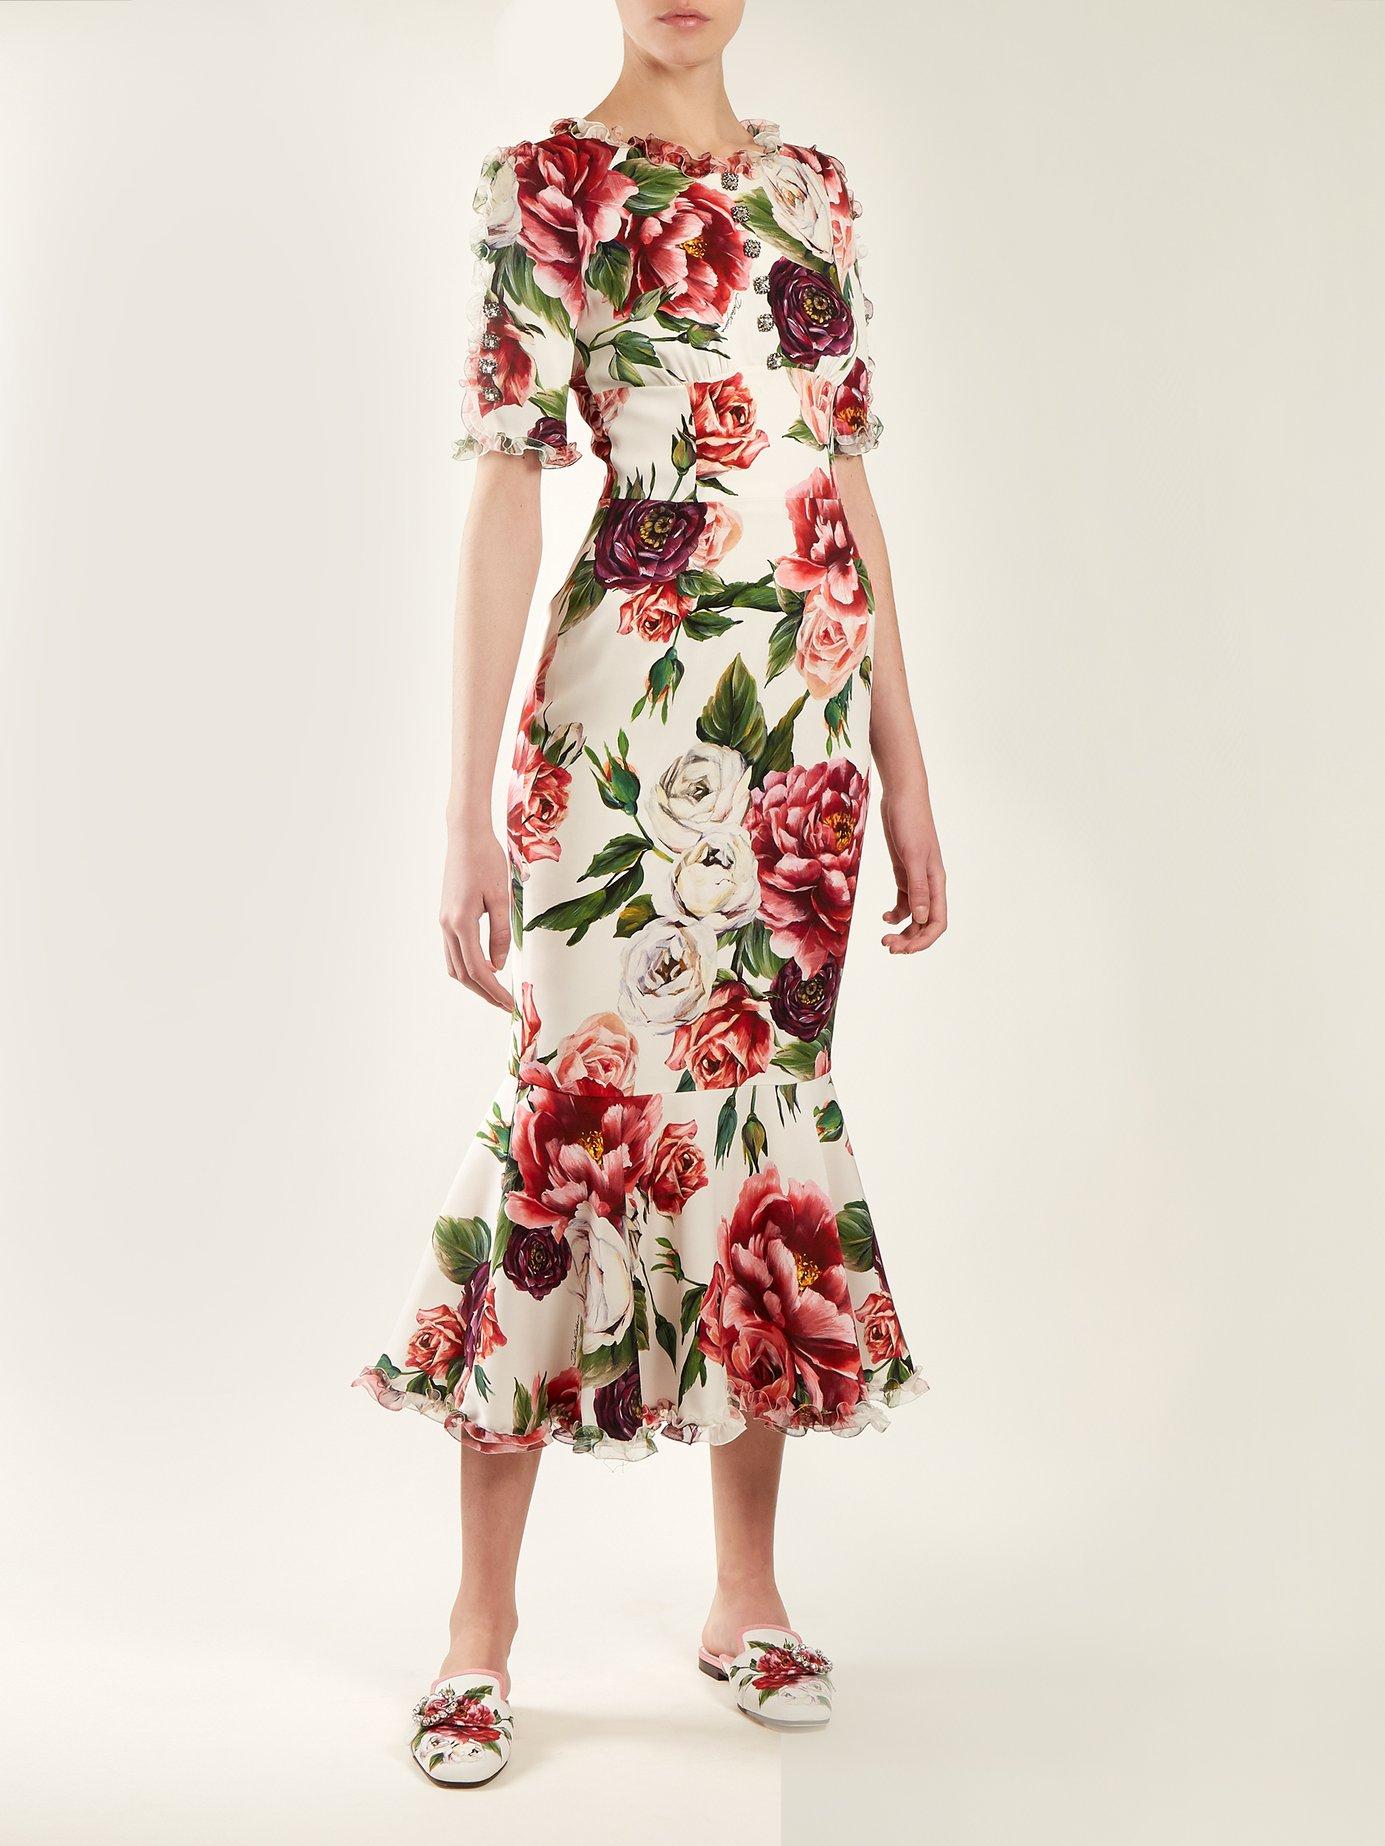 Peony-print silk-charmeuse dress by Dolce & Gabbana